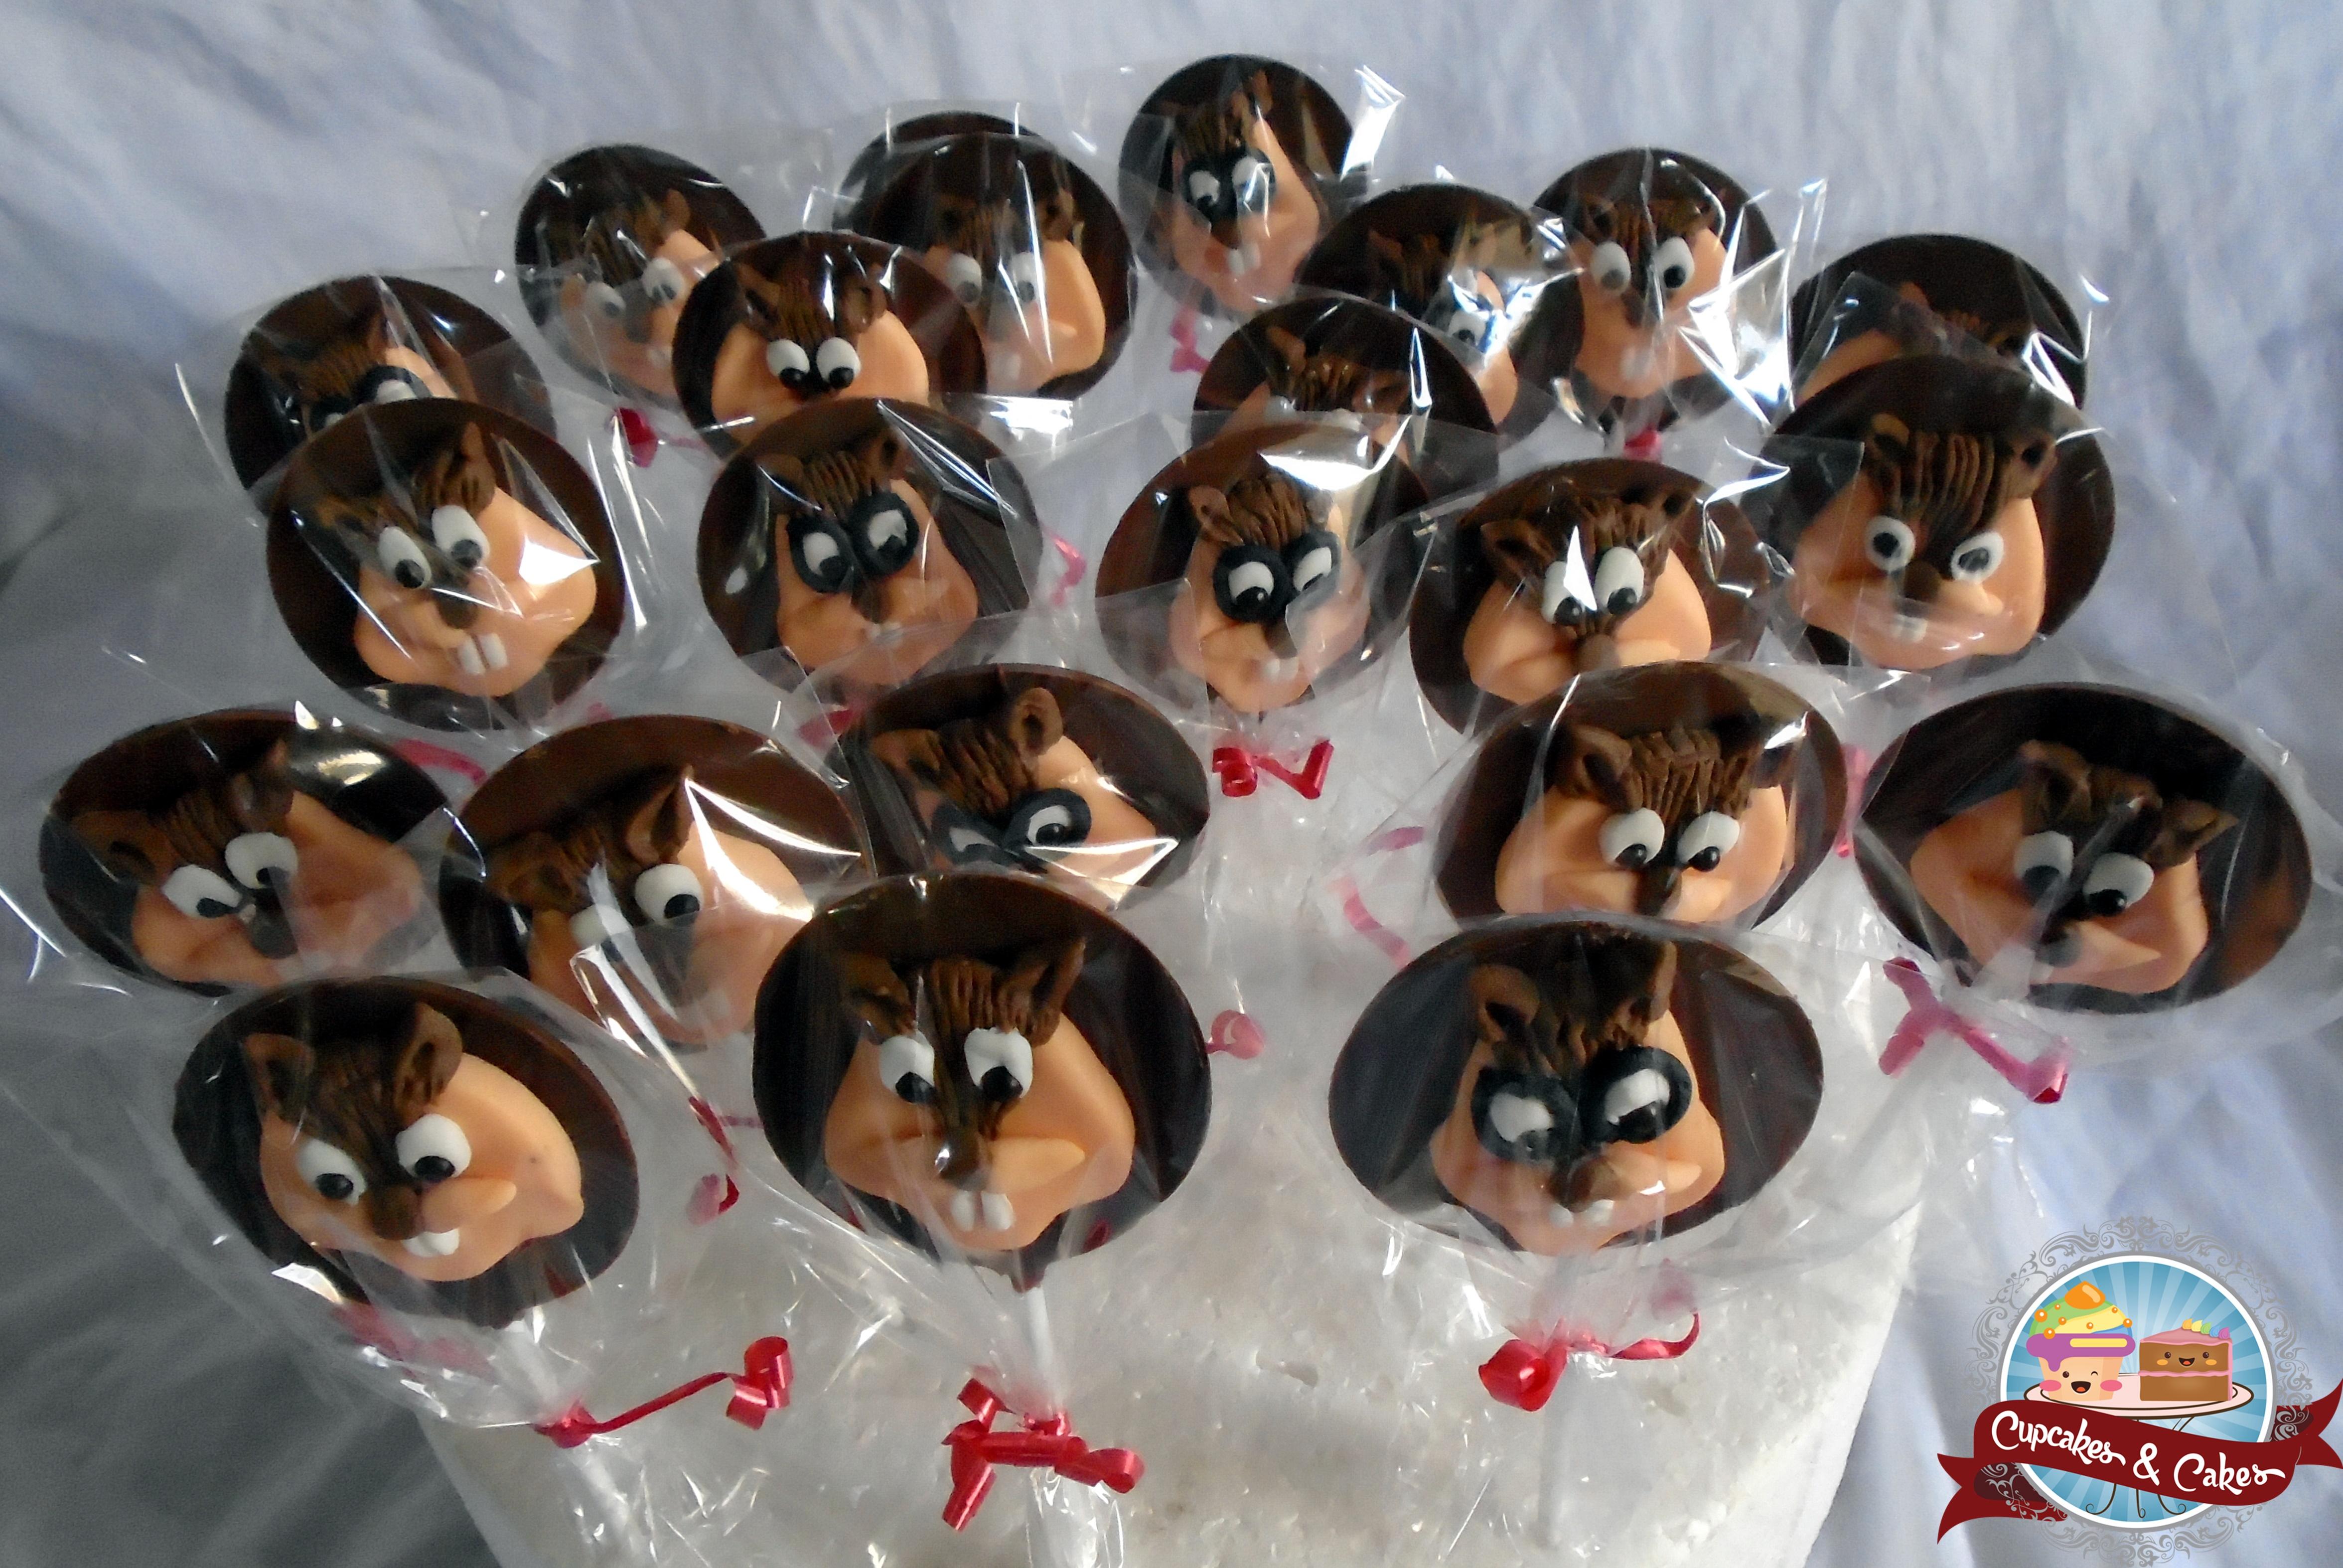 Pirulitos Alvin and the Chipmunks